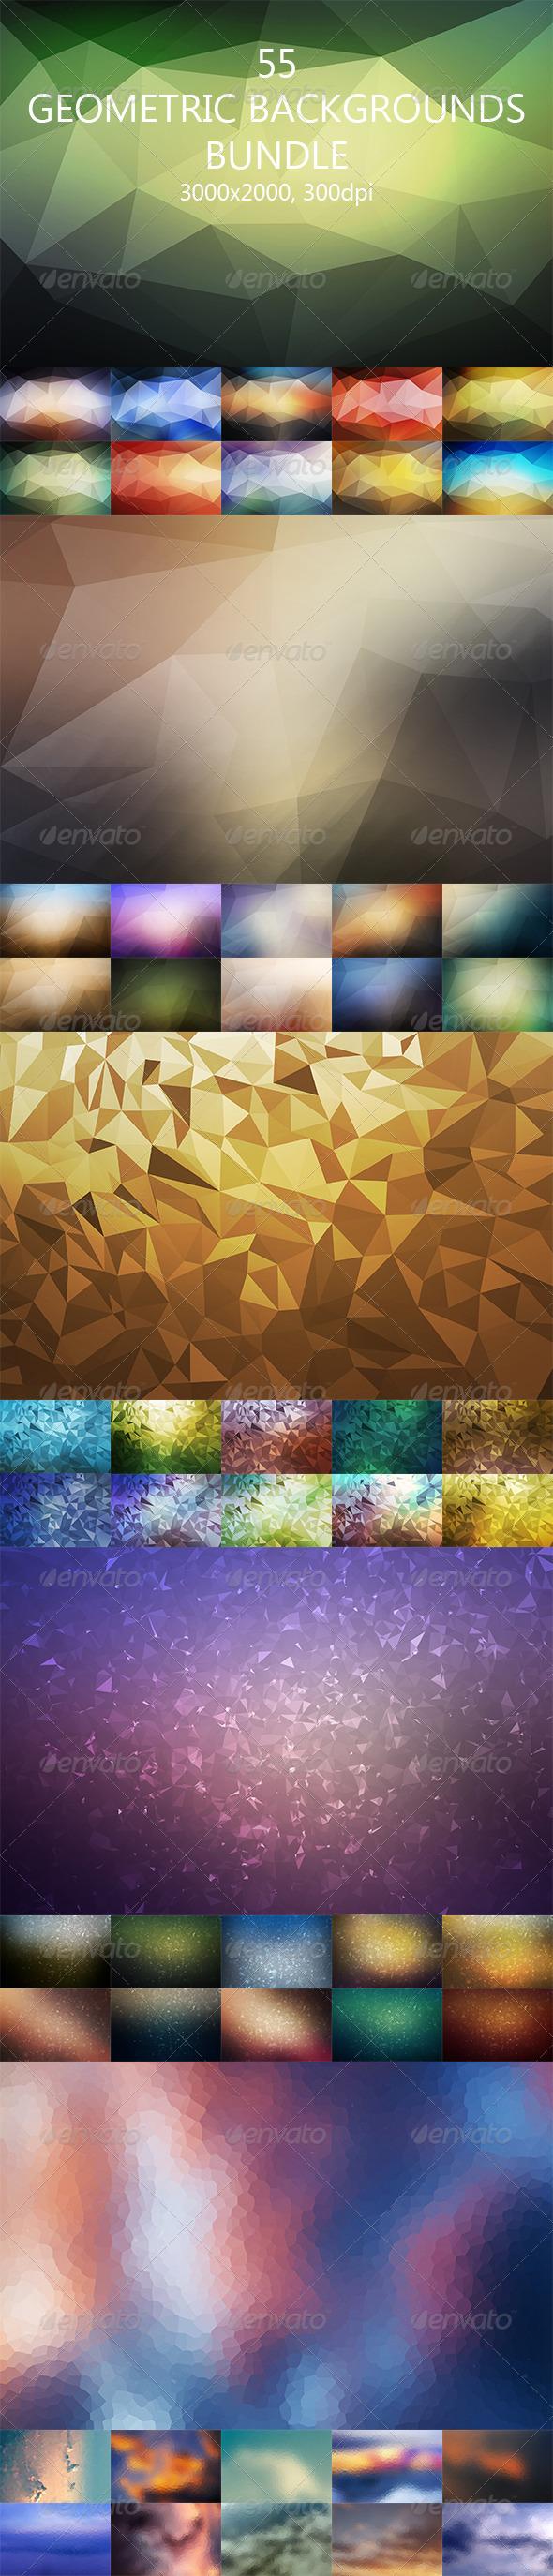 55 Geometric Backgrounds Bundle